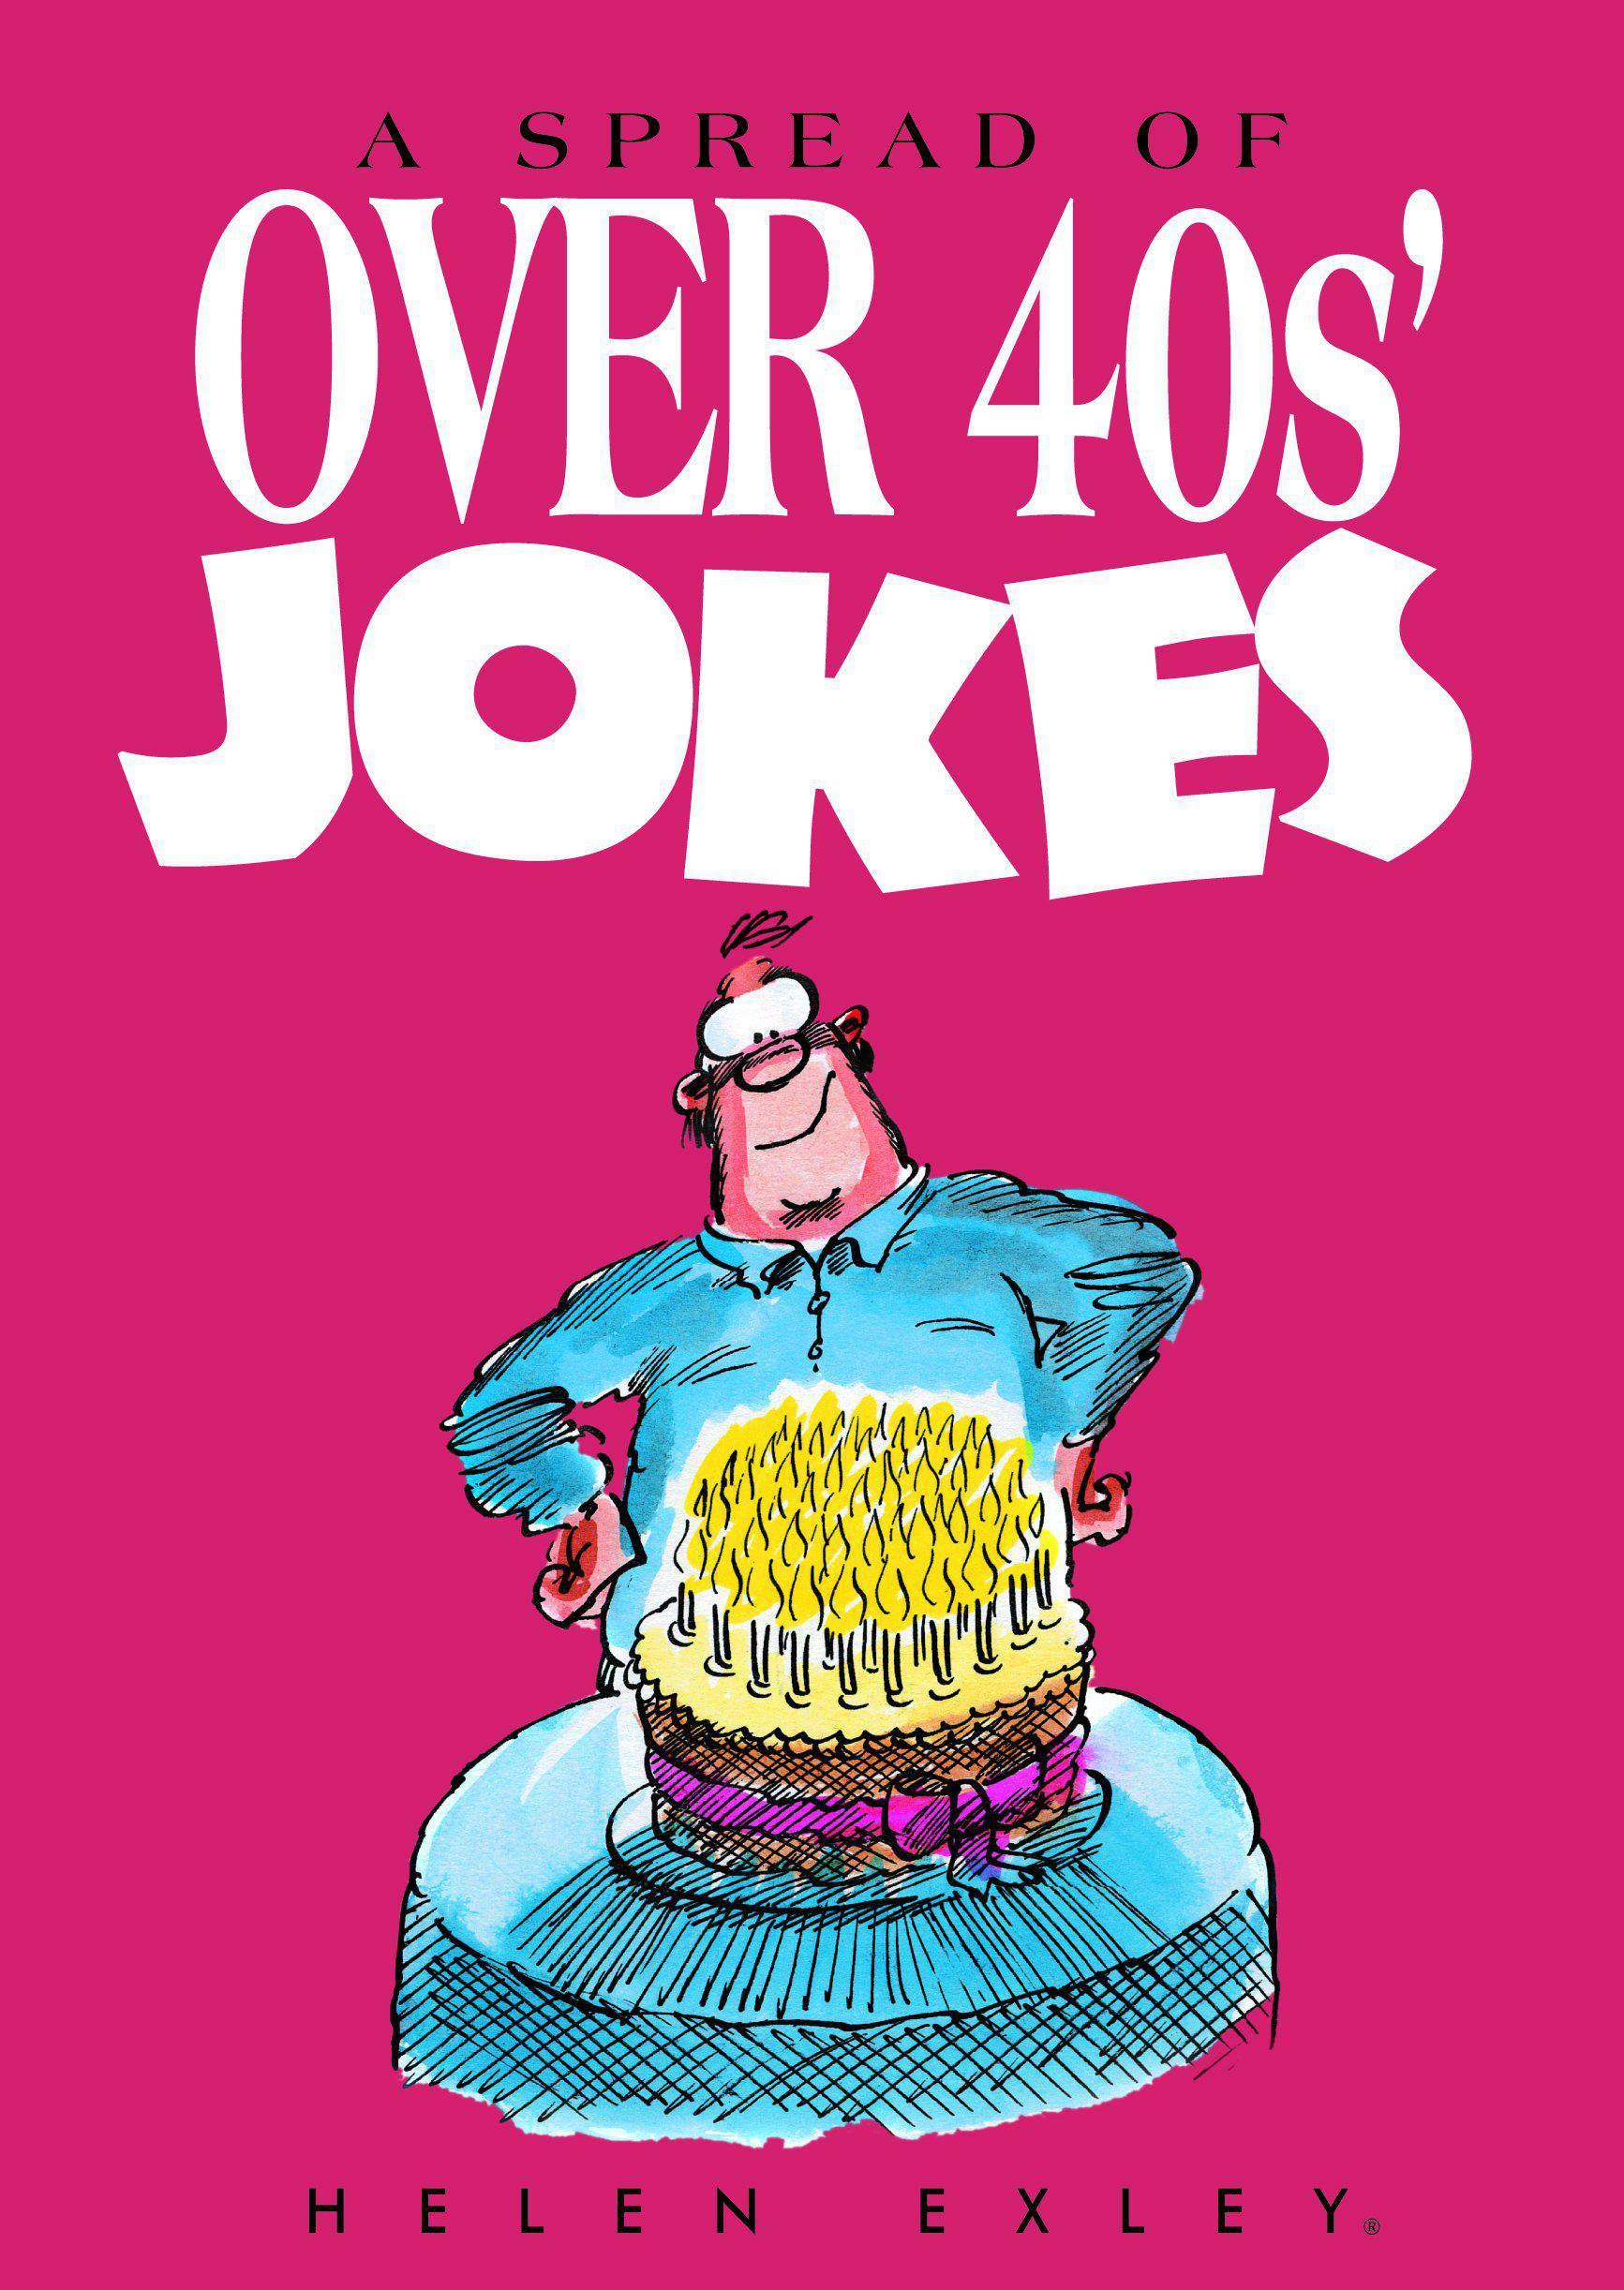 Spread of Over 40s Jokes